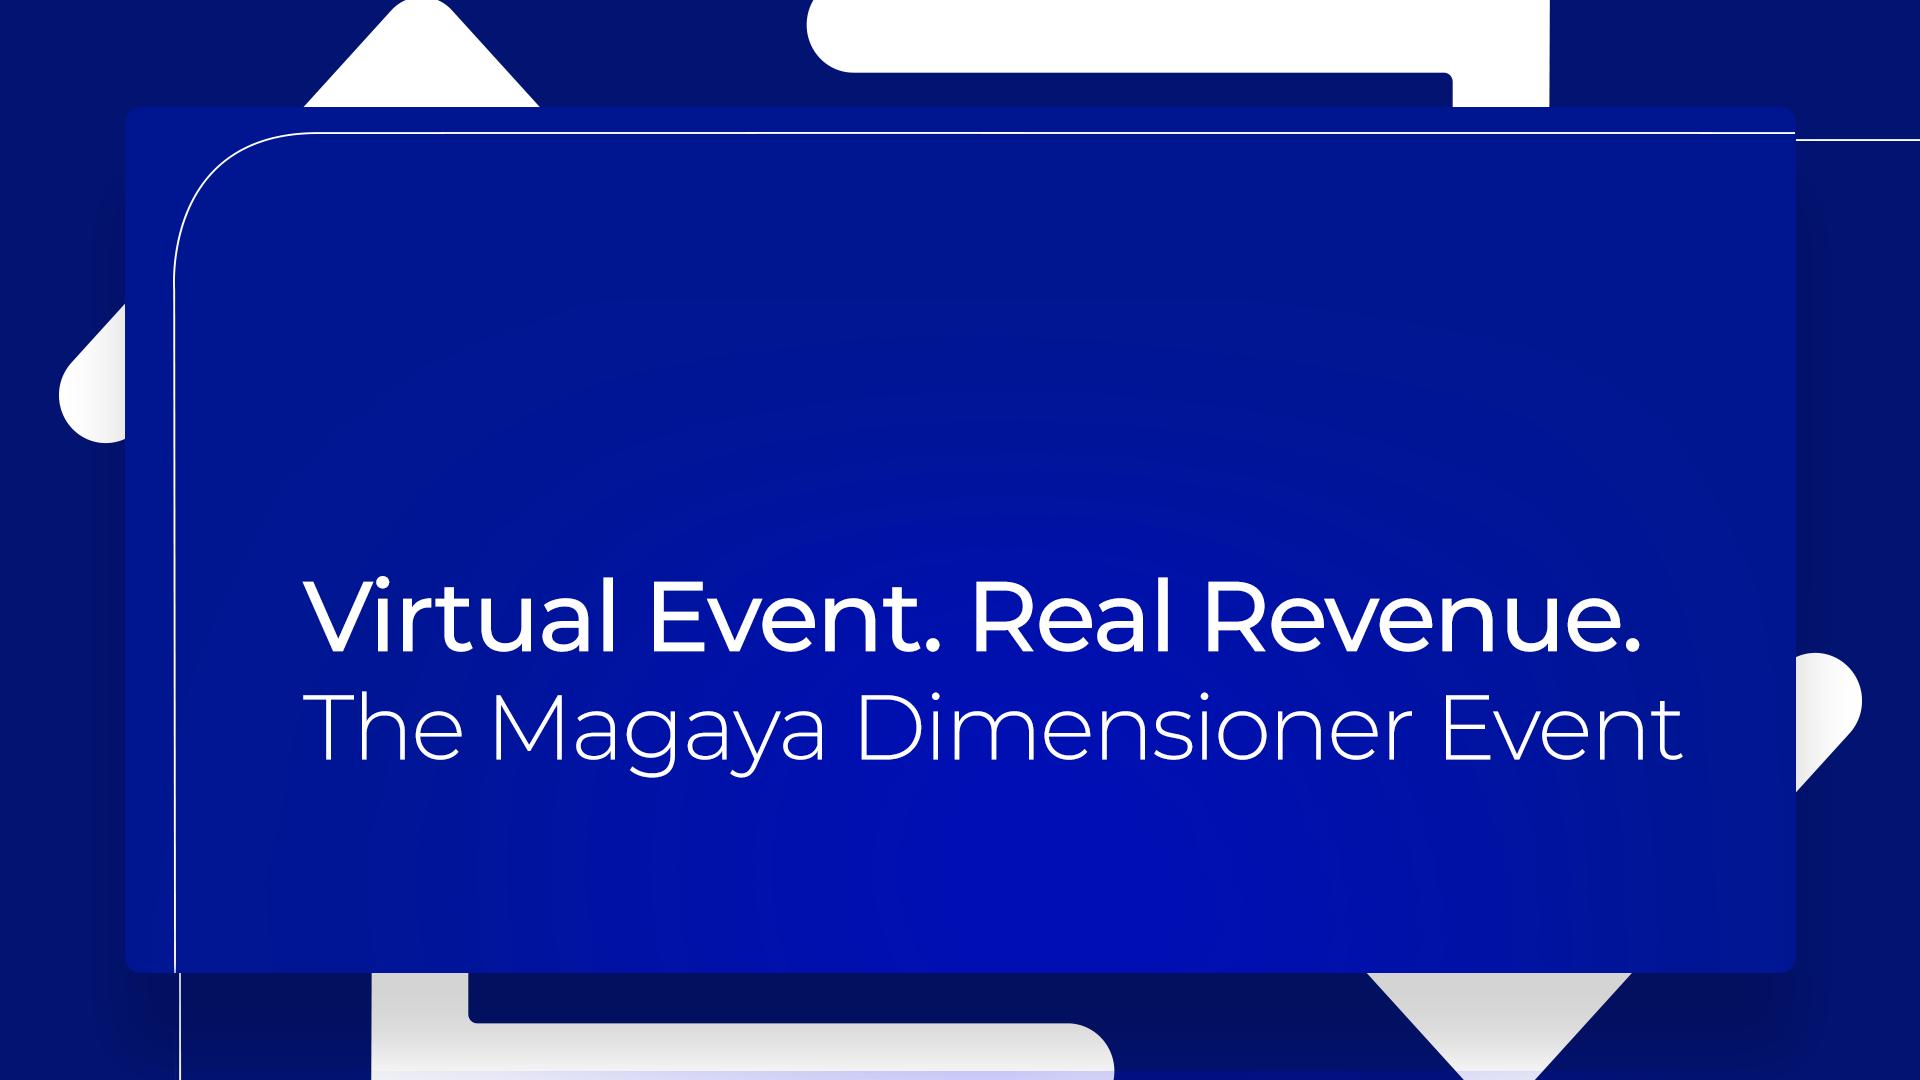 Virtual Event. Real Revenue. The Magaya Dimensioner Event.